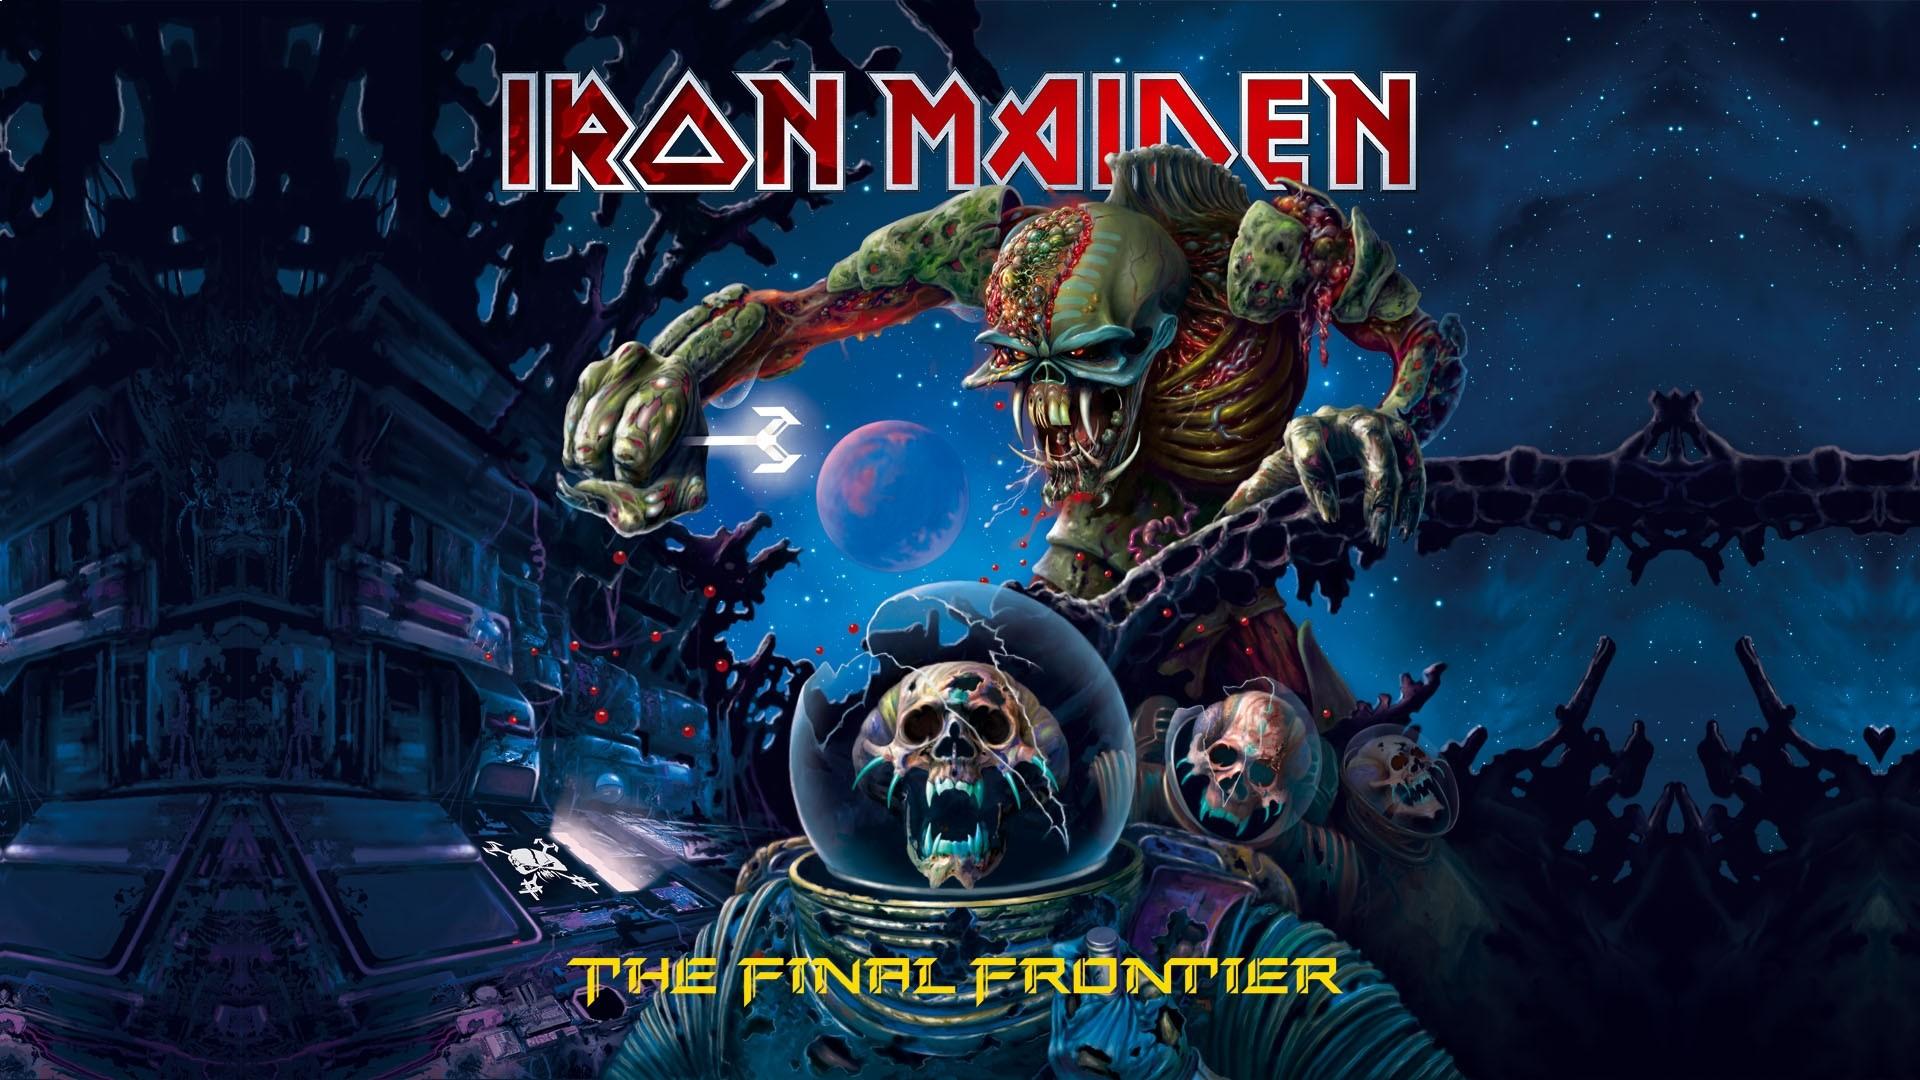 Wallpapers HD de Iron Maiden [Muchos]